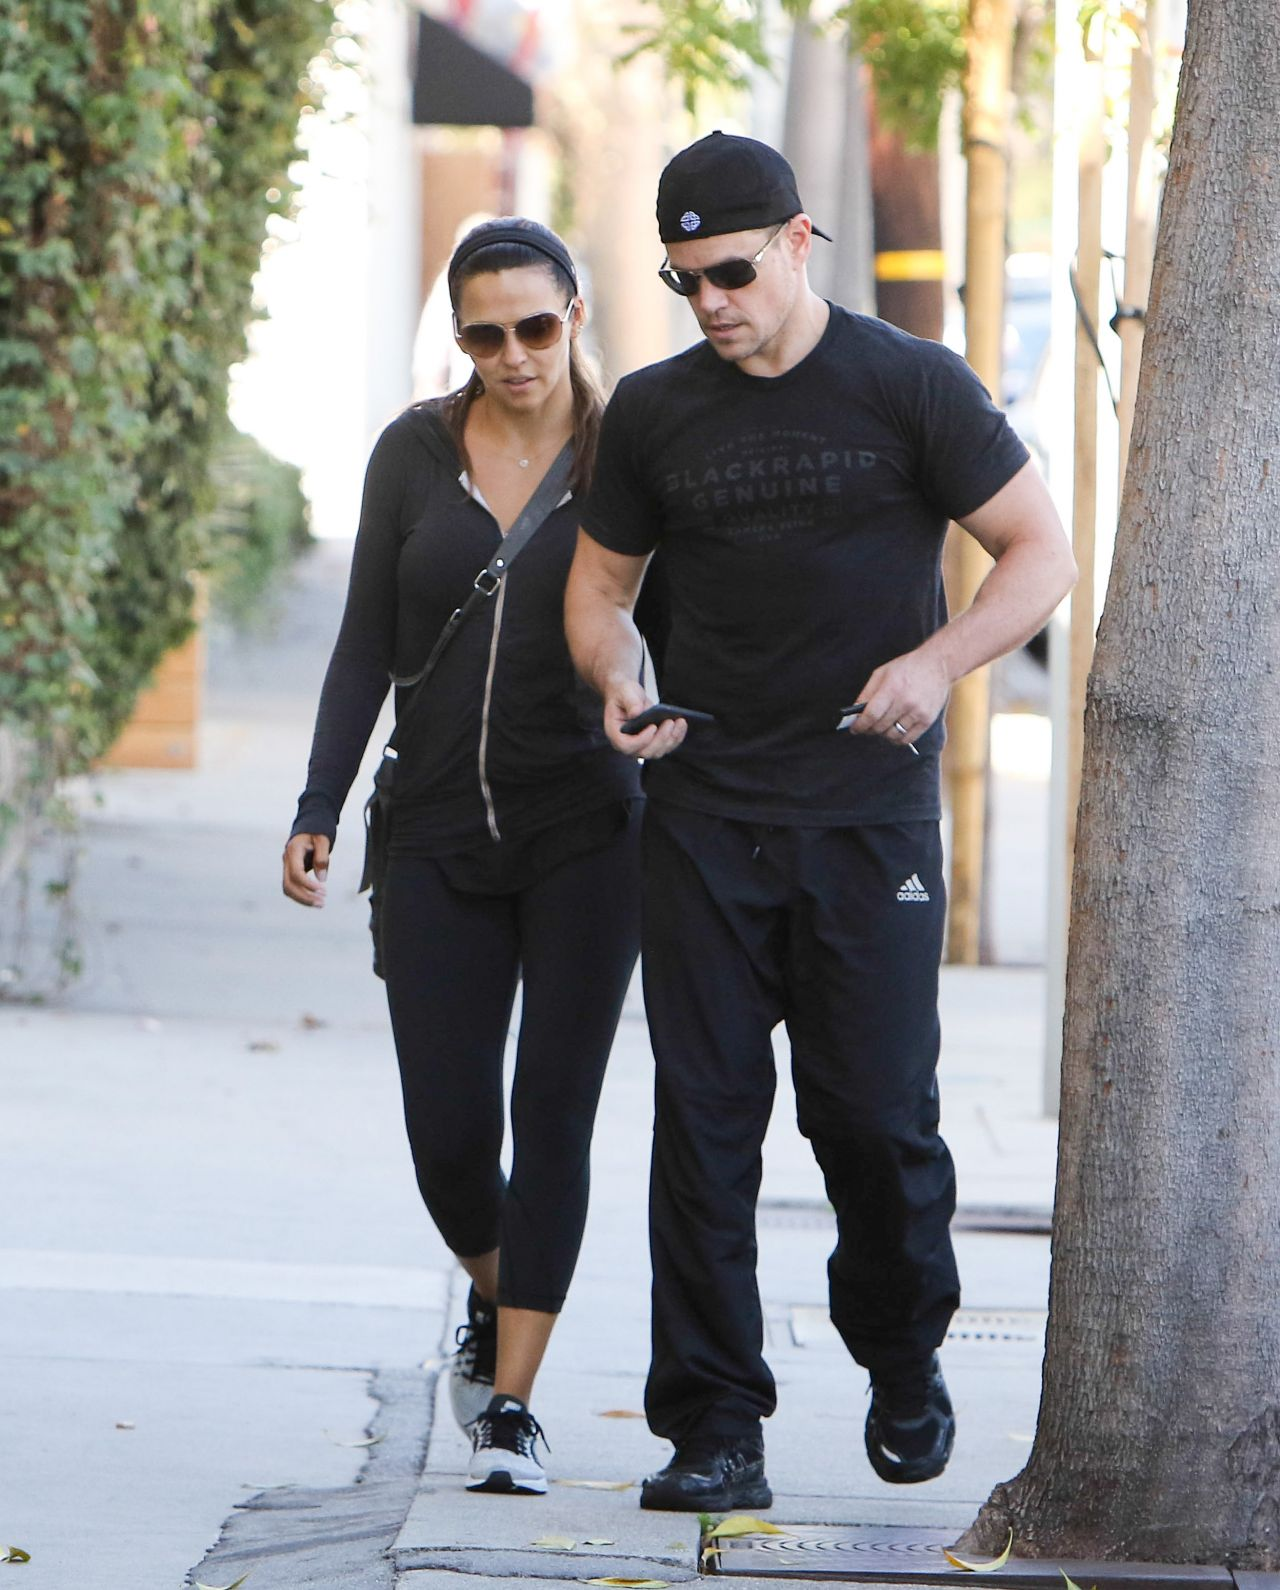 luciana barroso amp matt damon leaving their gym in los